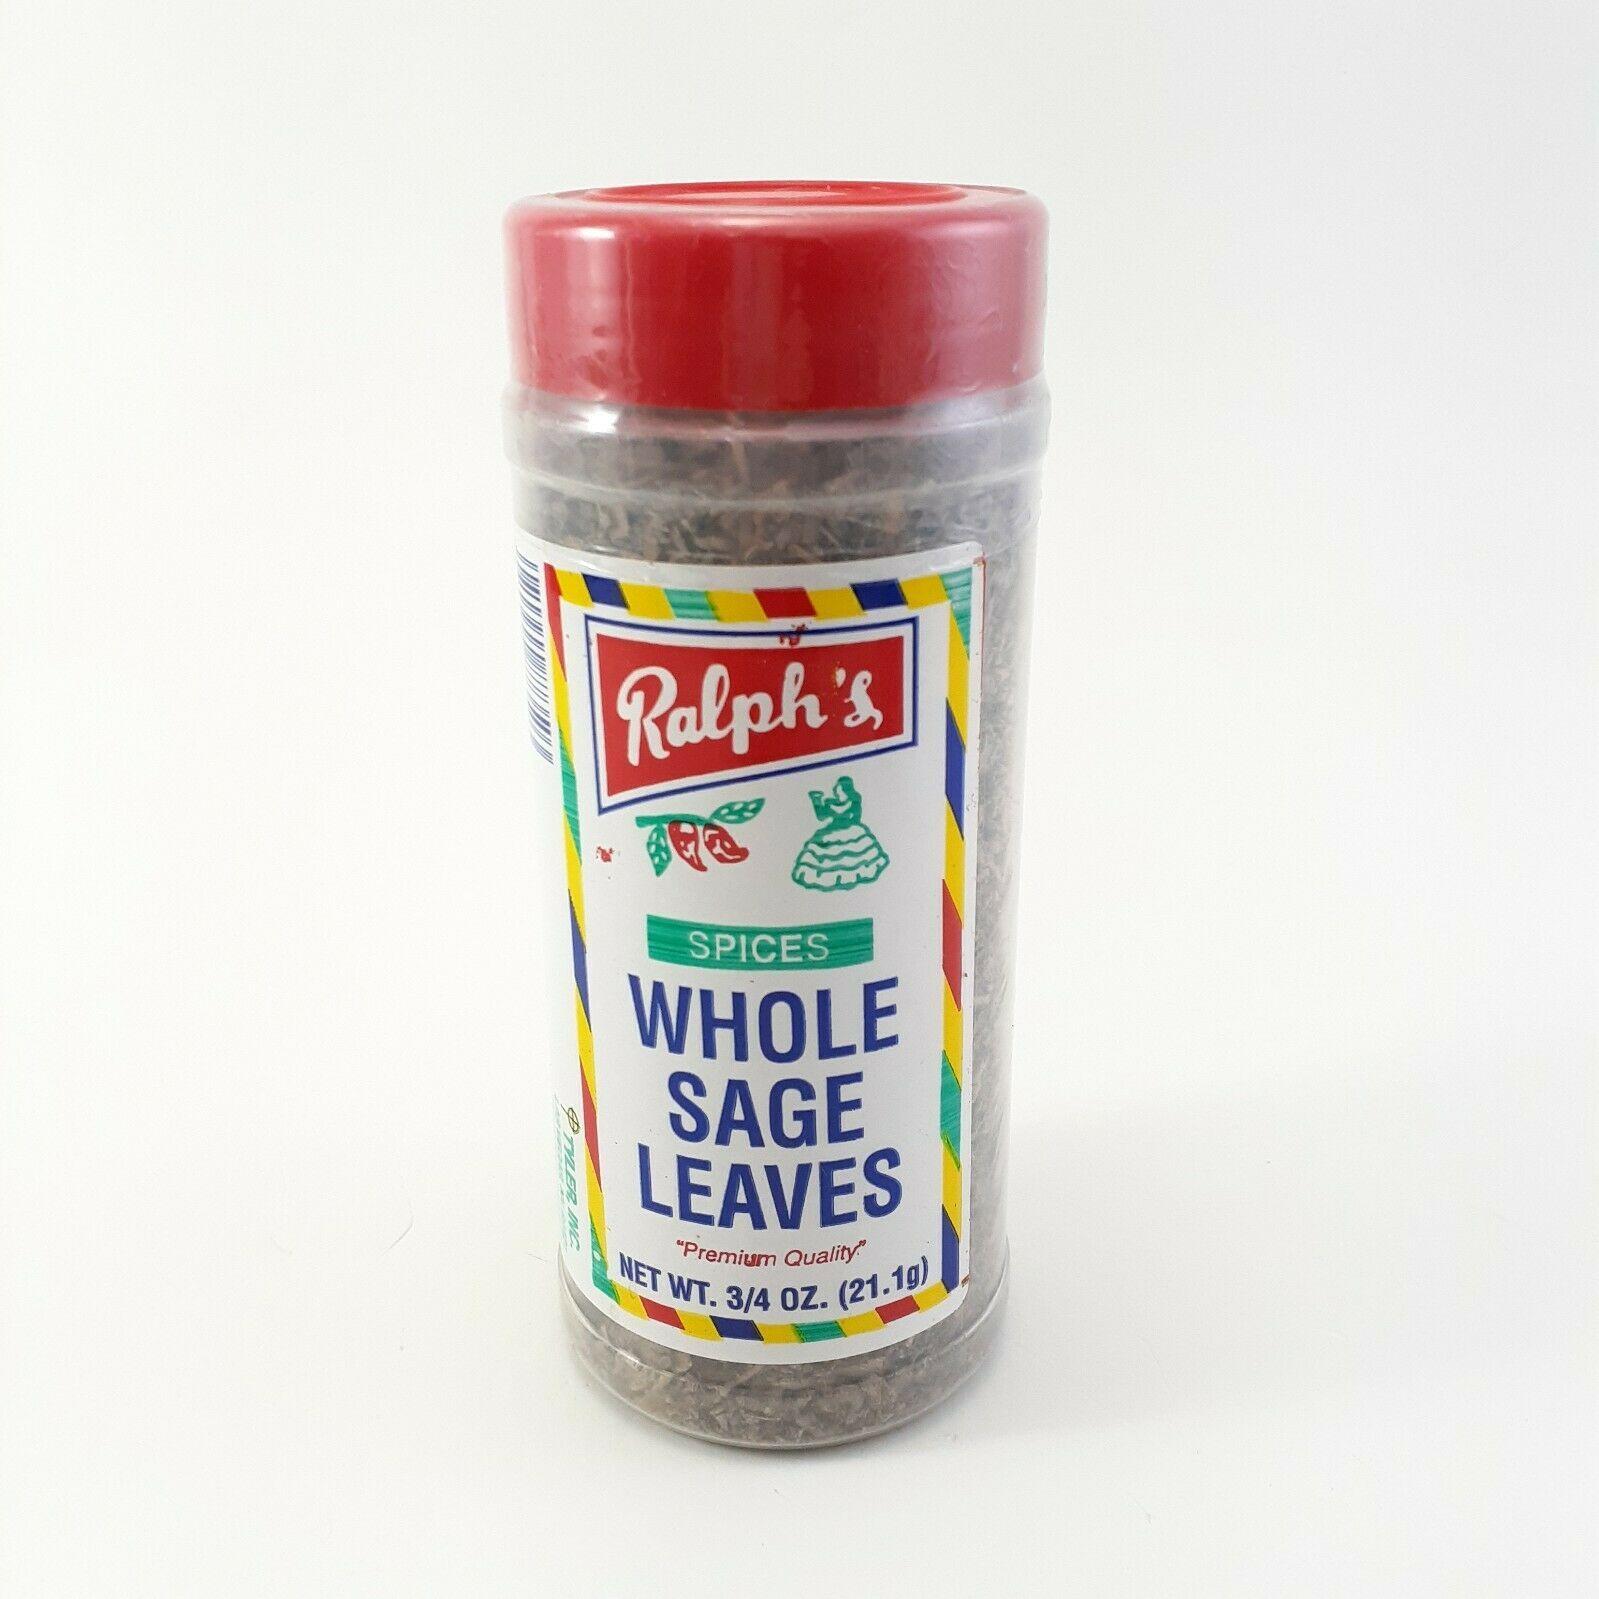 Whole Sage Leaves 3/4 oz Ralph's Spices Premium Quality